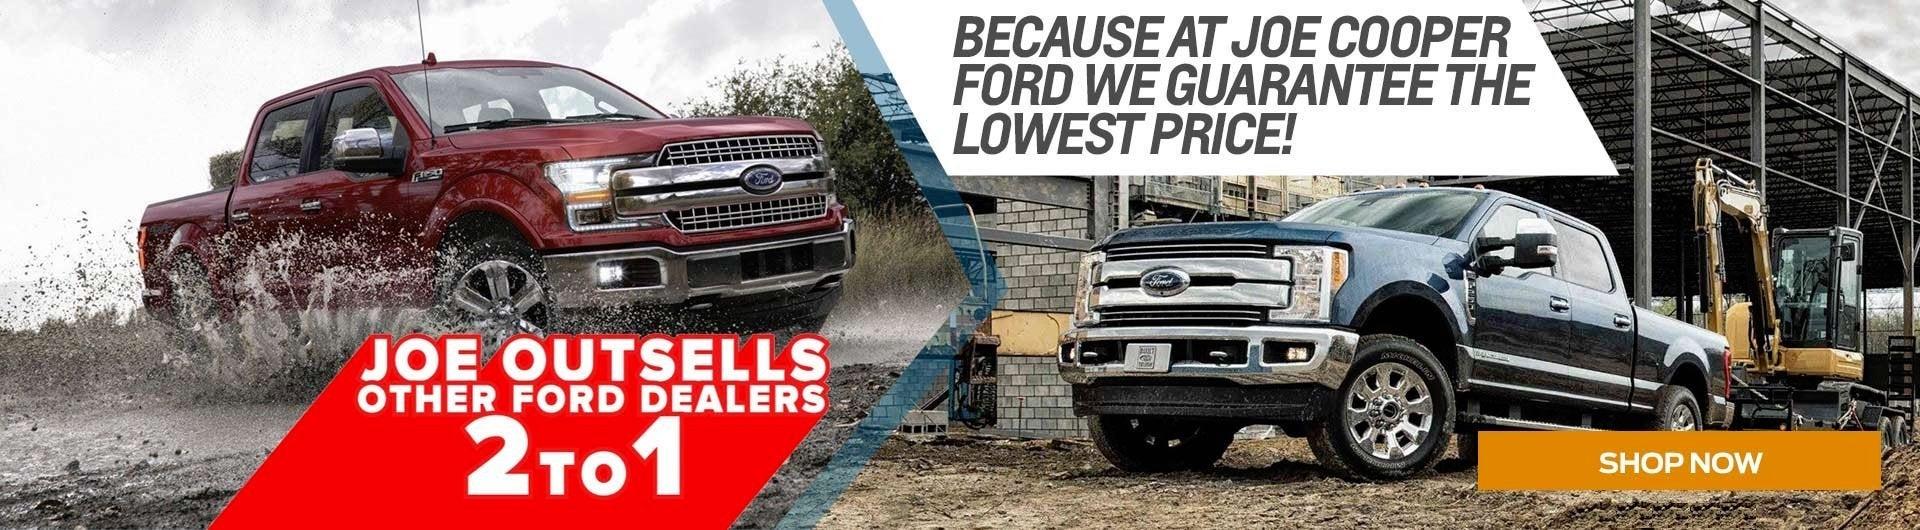 Joe Cooper Ford >> New Used Ford Dealer In Okc Near Edmond Joe Cooper Ford